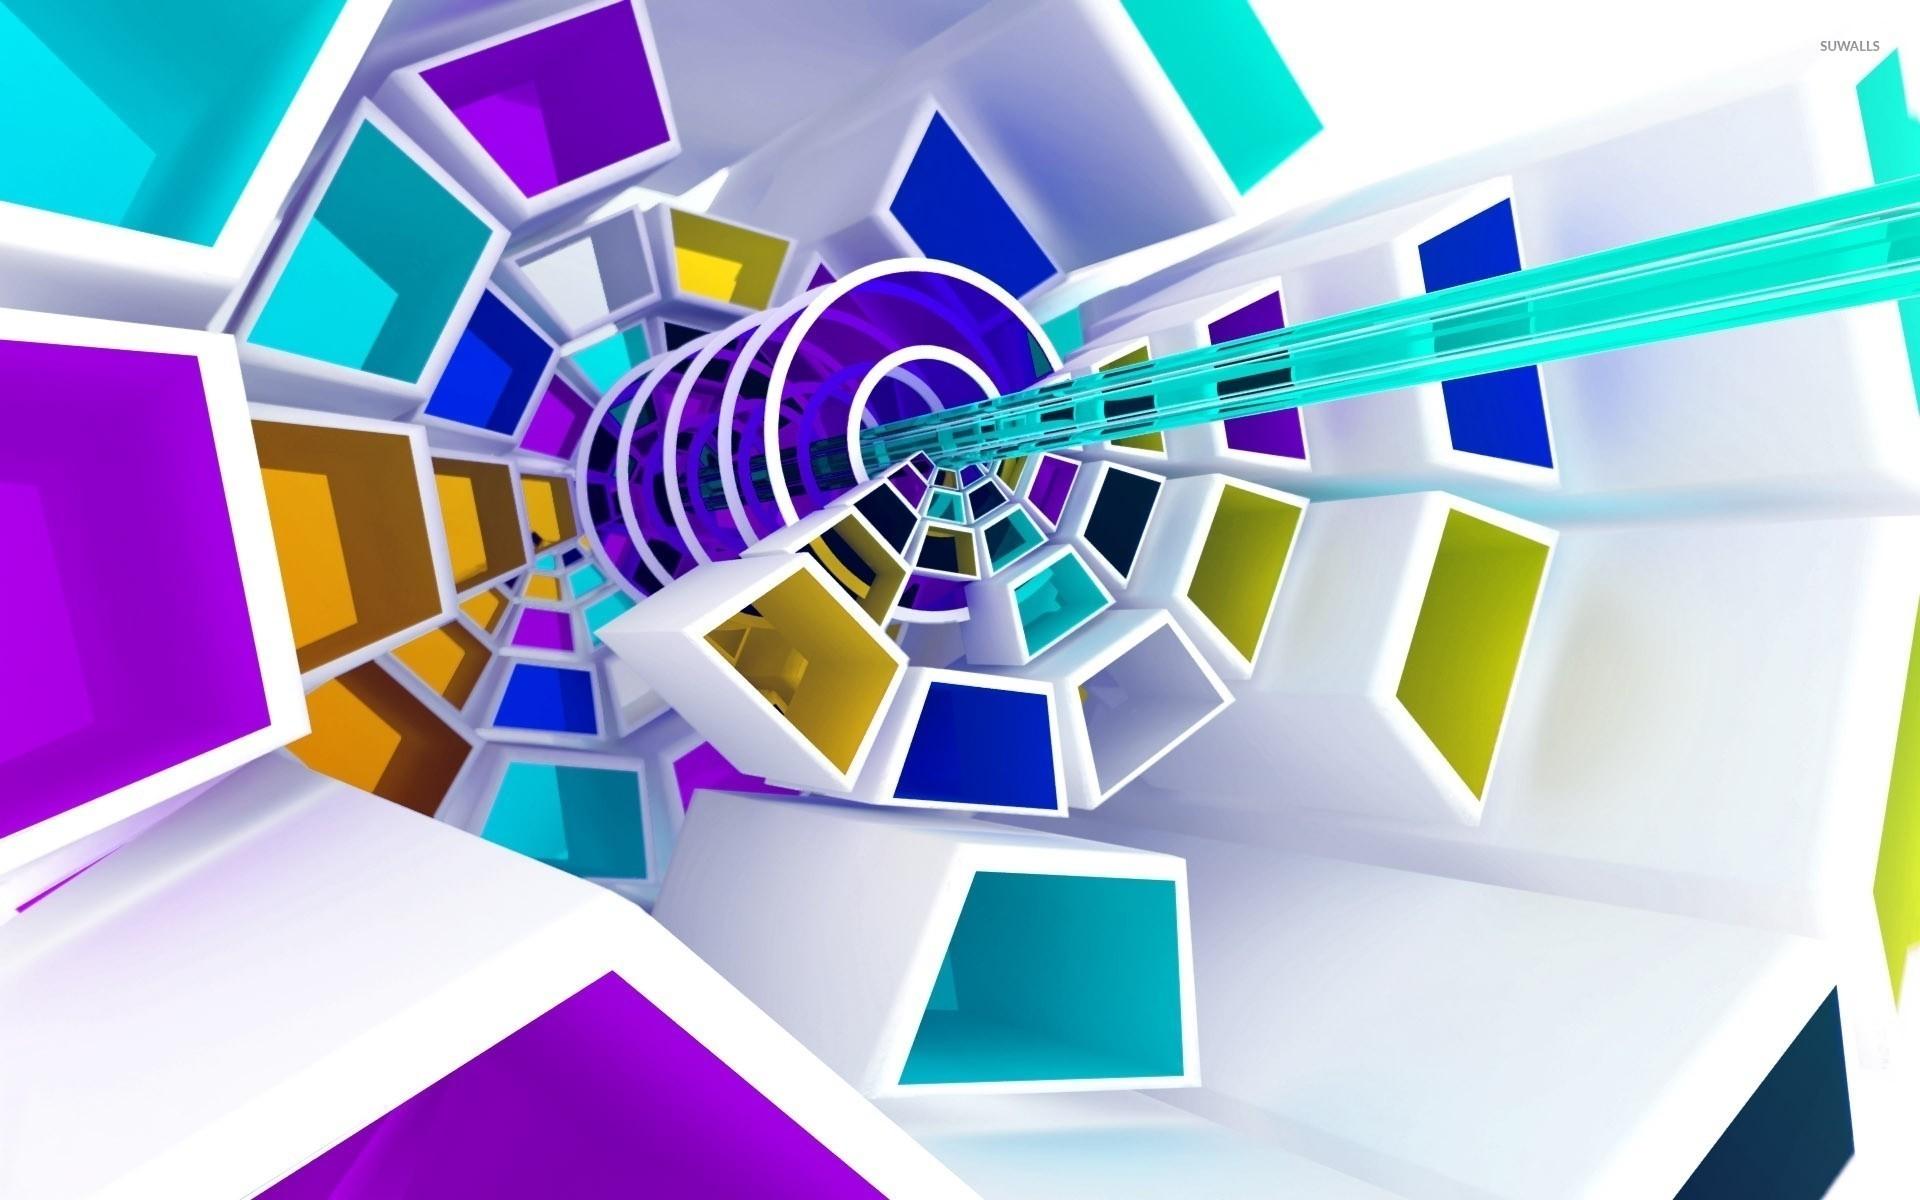 Spiraling shapes wallpaper jpg